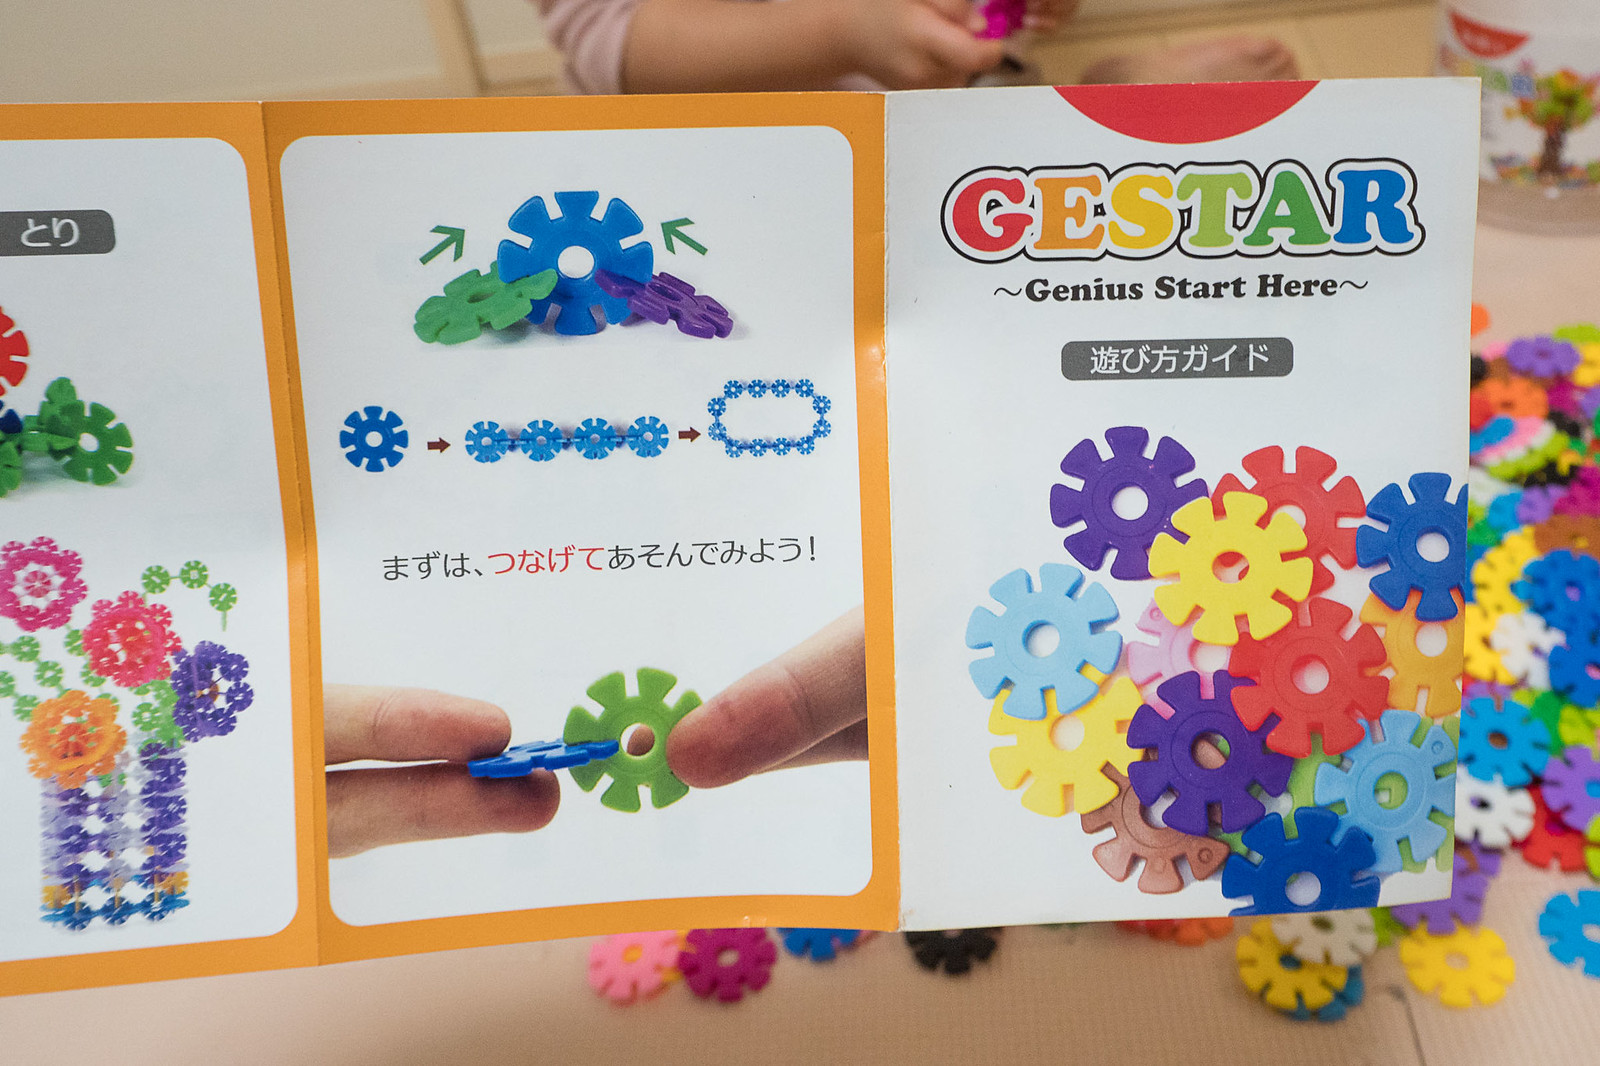 GESTAR-6